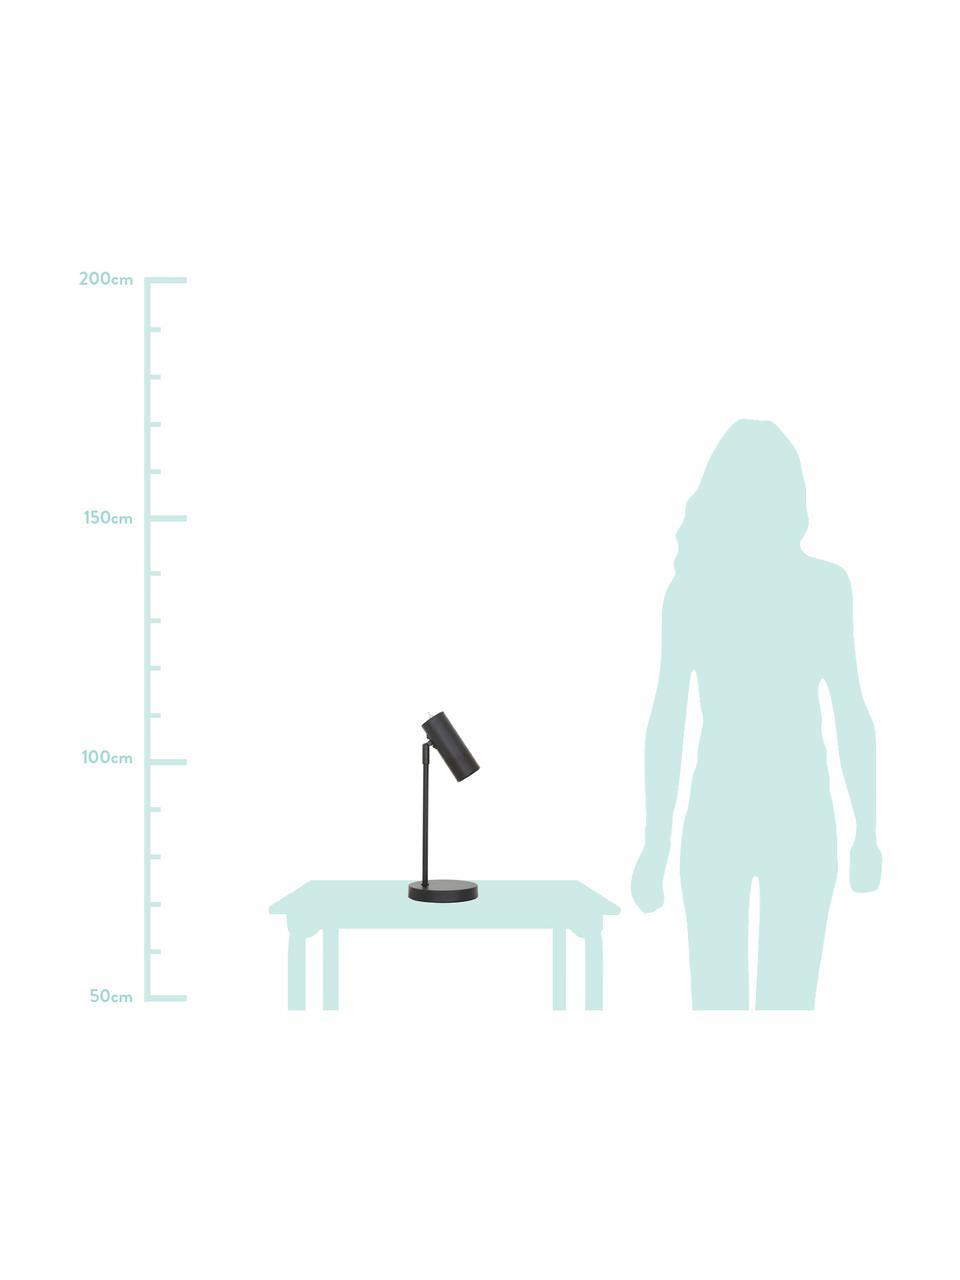 Moderne Schreibtischlampe Cassandra aus Metall, Lampenschirm: Metall, pulverbeschichtet, Lampenfuß: Metall, pulverbeschichtet, Lampenschirm:Schwarz, mattLampenfuß:Schwarz, mattKabel: Schwarz, Ø 15 x H 40  cm